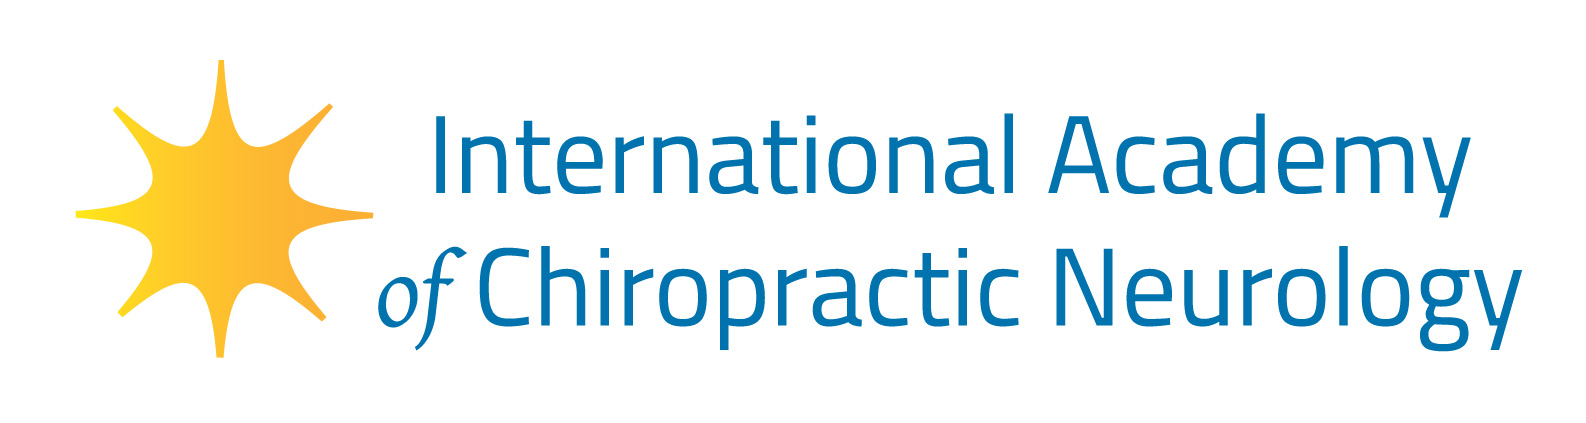 International Academy of Chiropractic Neurology - Board Review